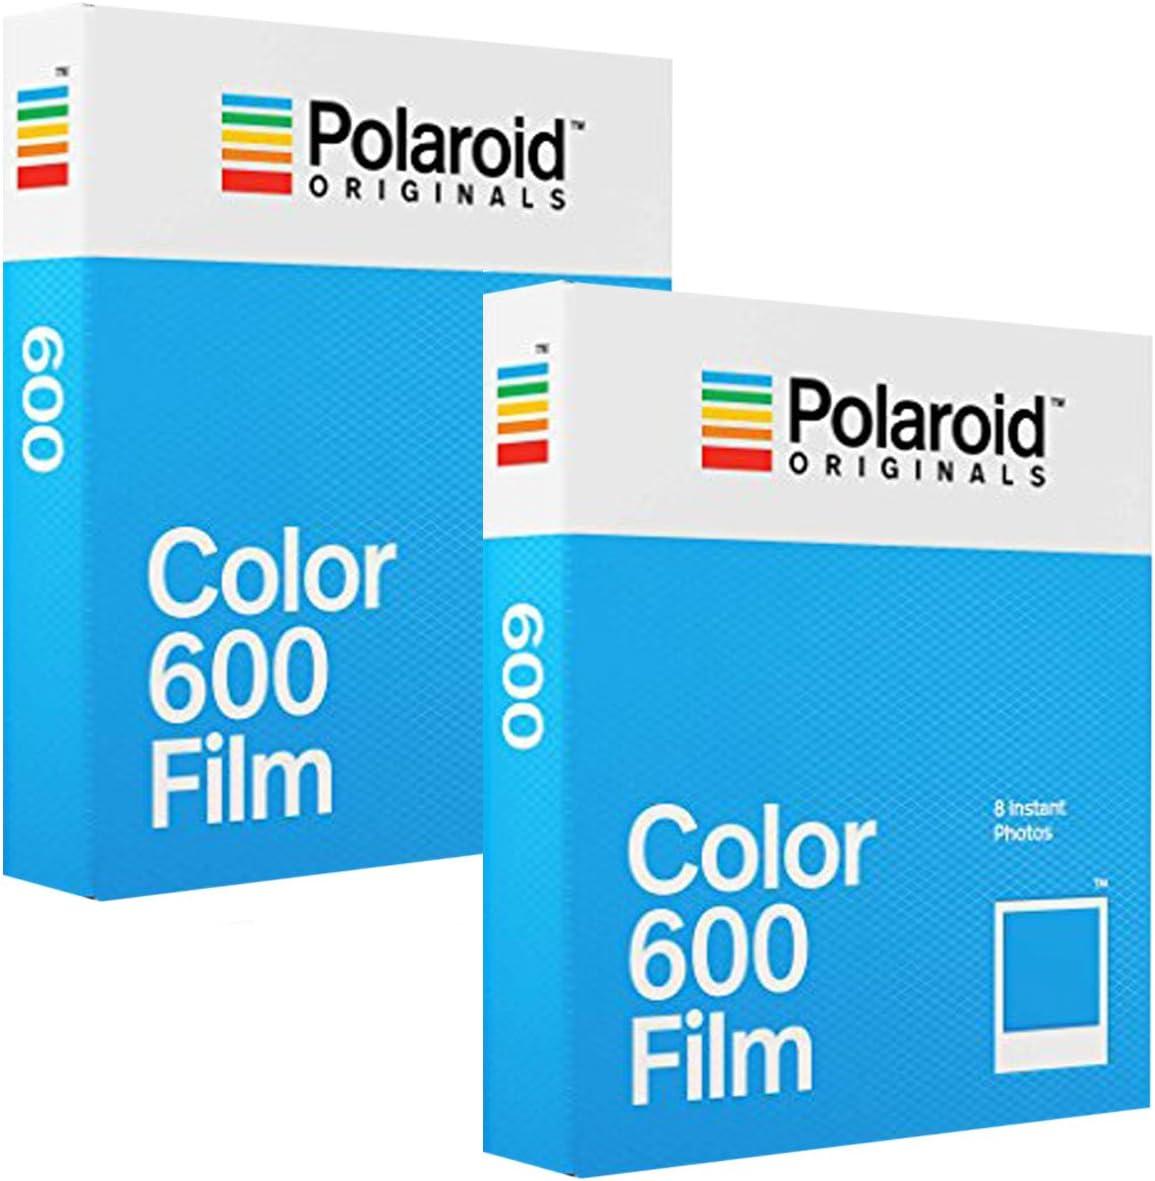 Polaroid Instant Film With Colour 600 Photo Porst 2 X Camera Photo